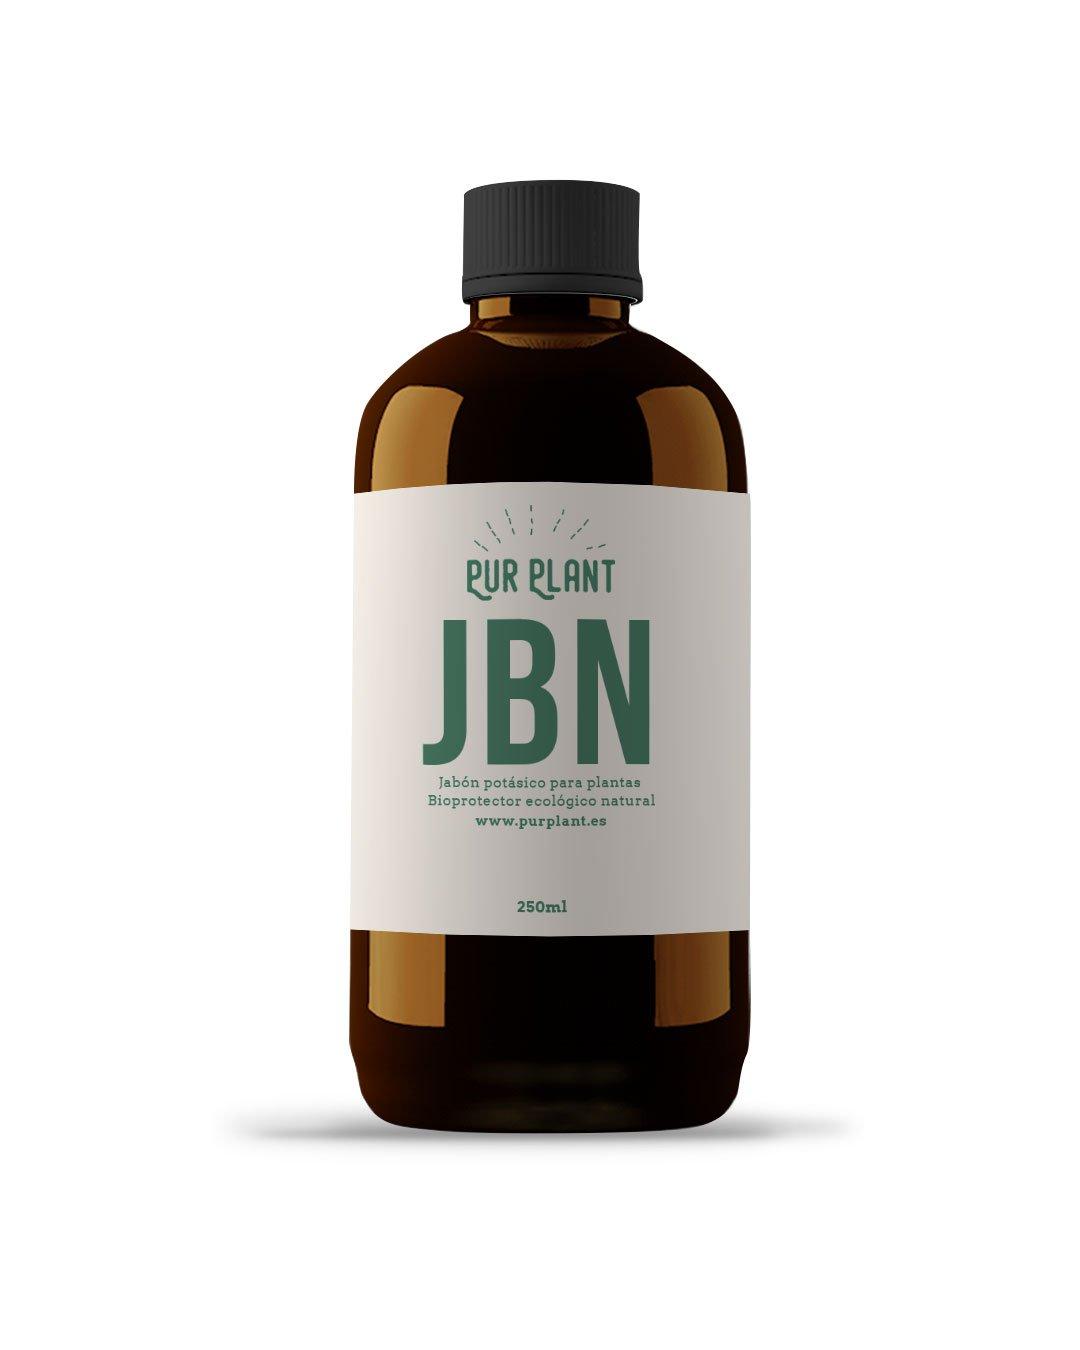 Jabón Potásico – Insecticida ecológico